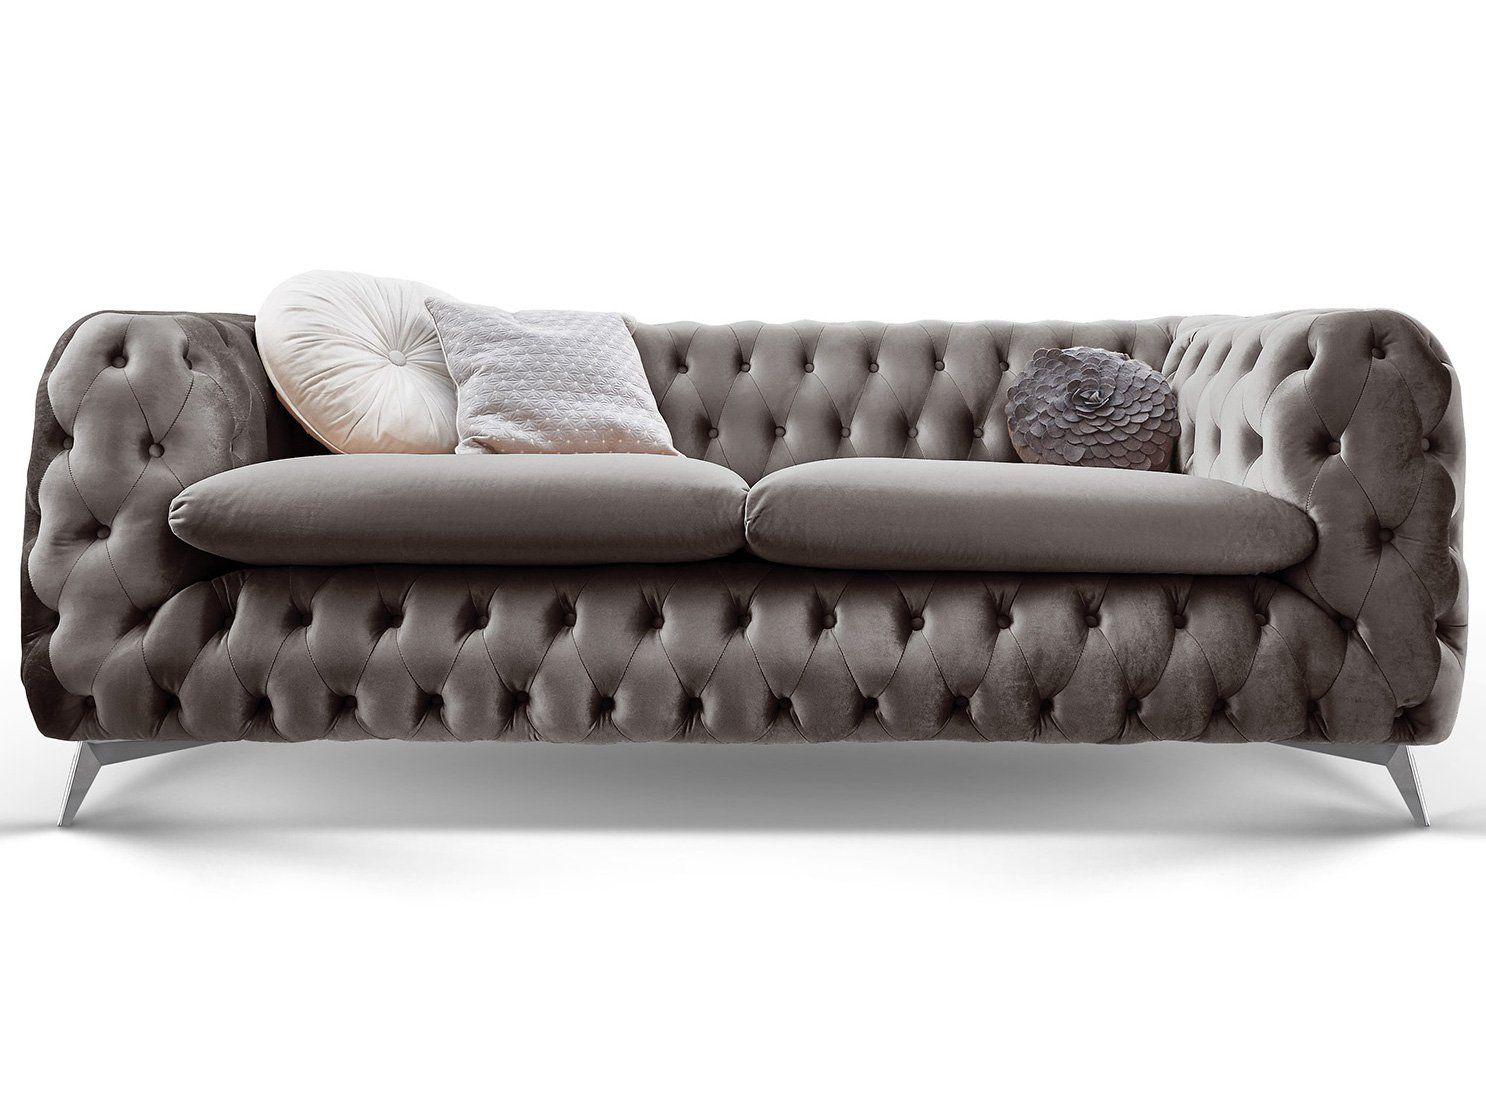 Chesterfield Sofa Couch Stoff Samt 3 Sitzer 2 Sitzer Sessel 1 Sitzer Designer Mobel Emma 3 Sitzer Silber Grau A In 2020 Chesterfield Sofa Sofa Couch Designer Couch